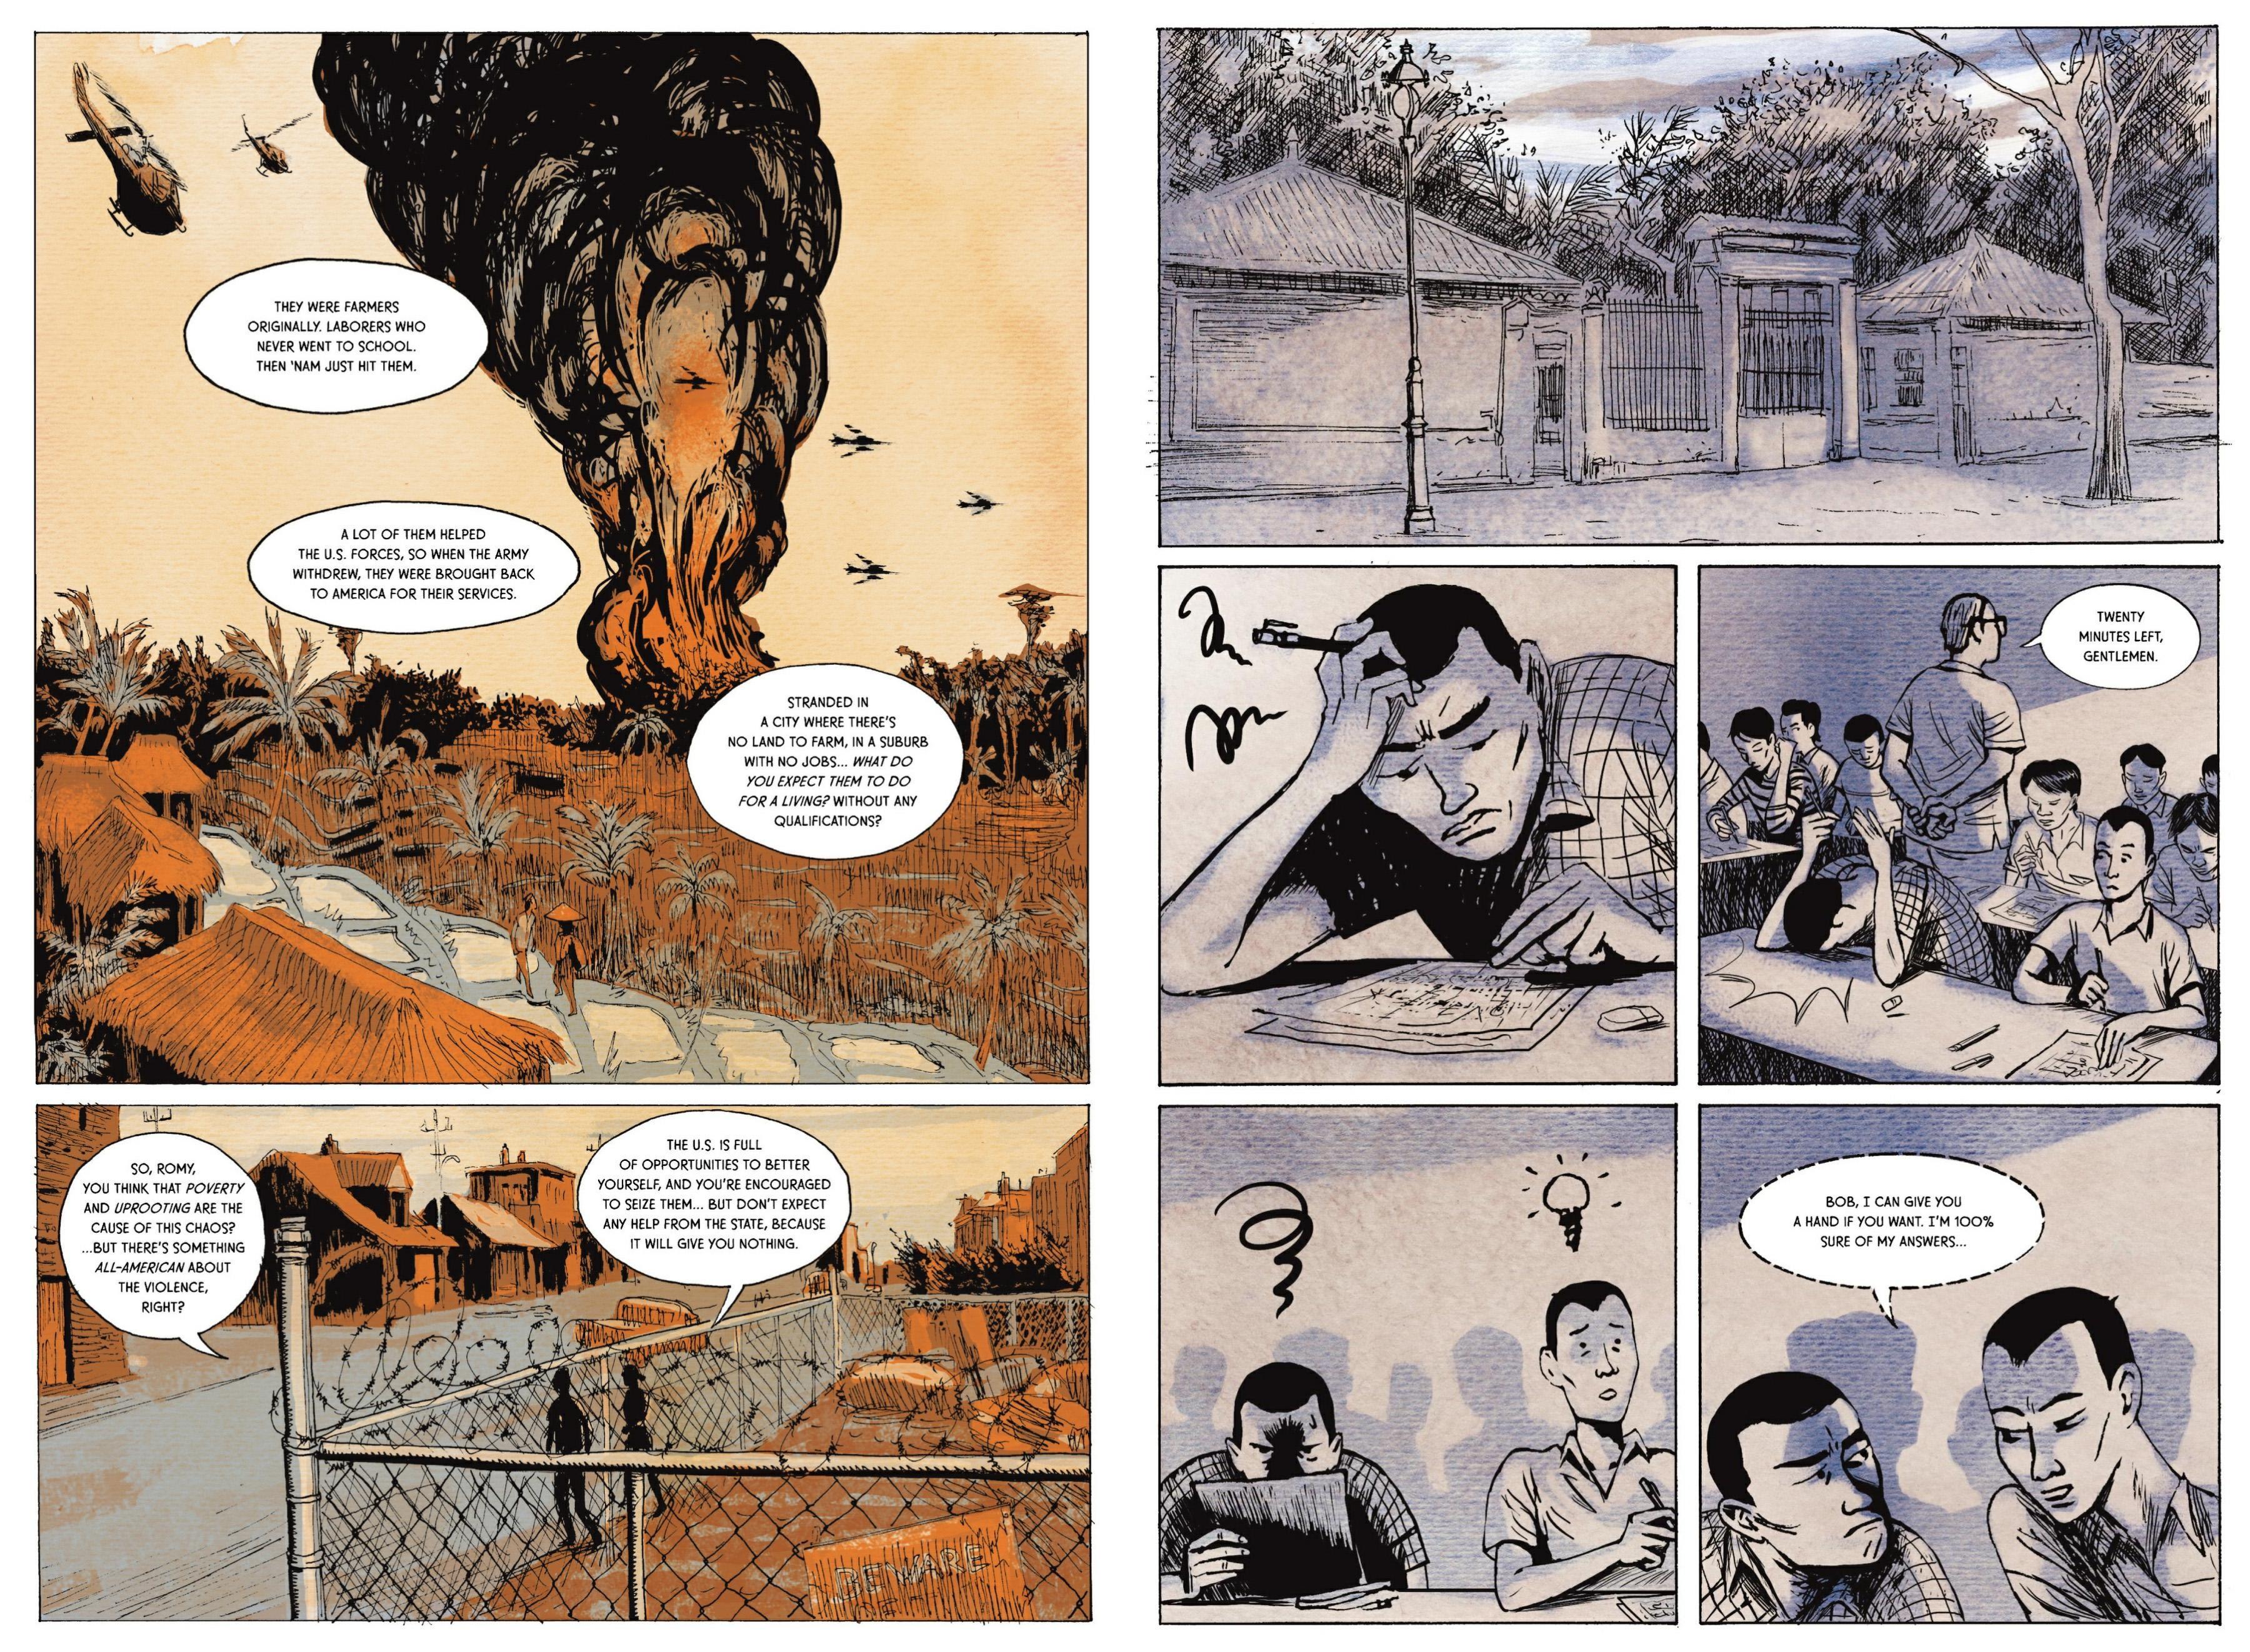 Vietnamese Memories - Little Saigon review